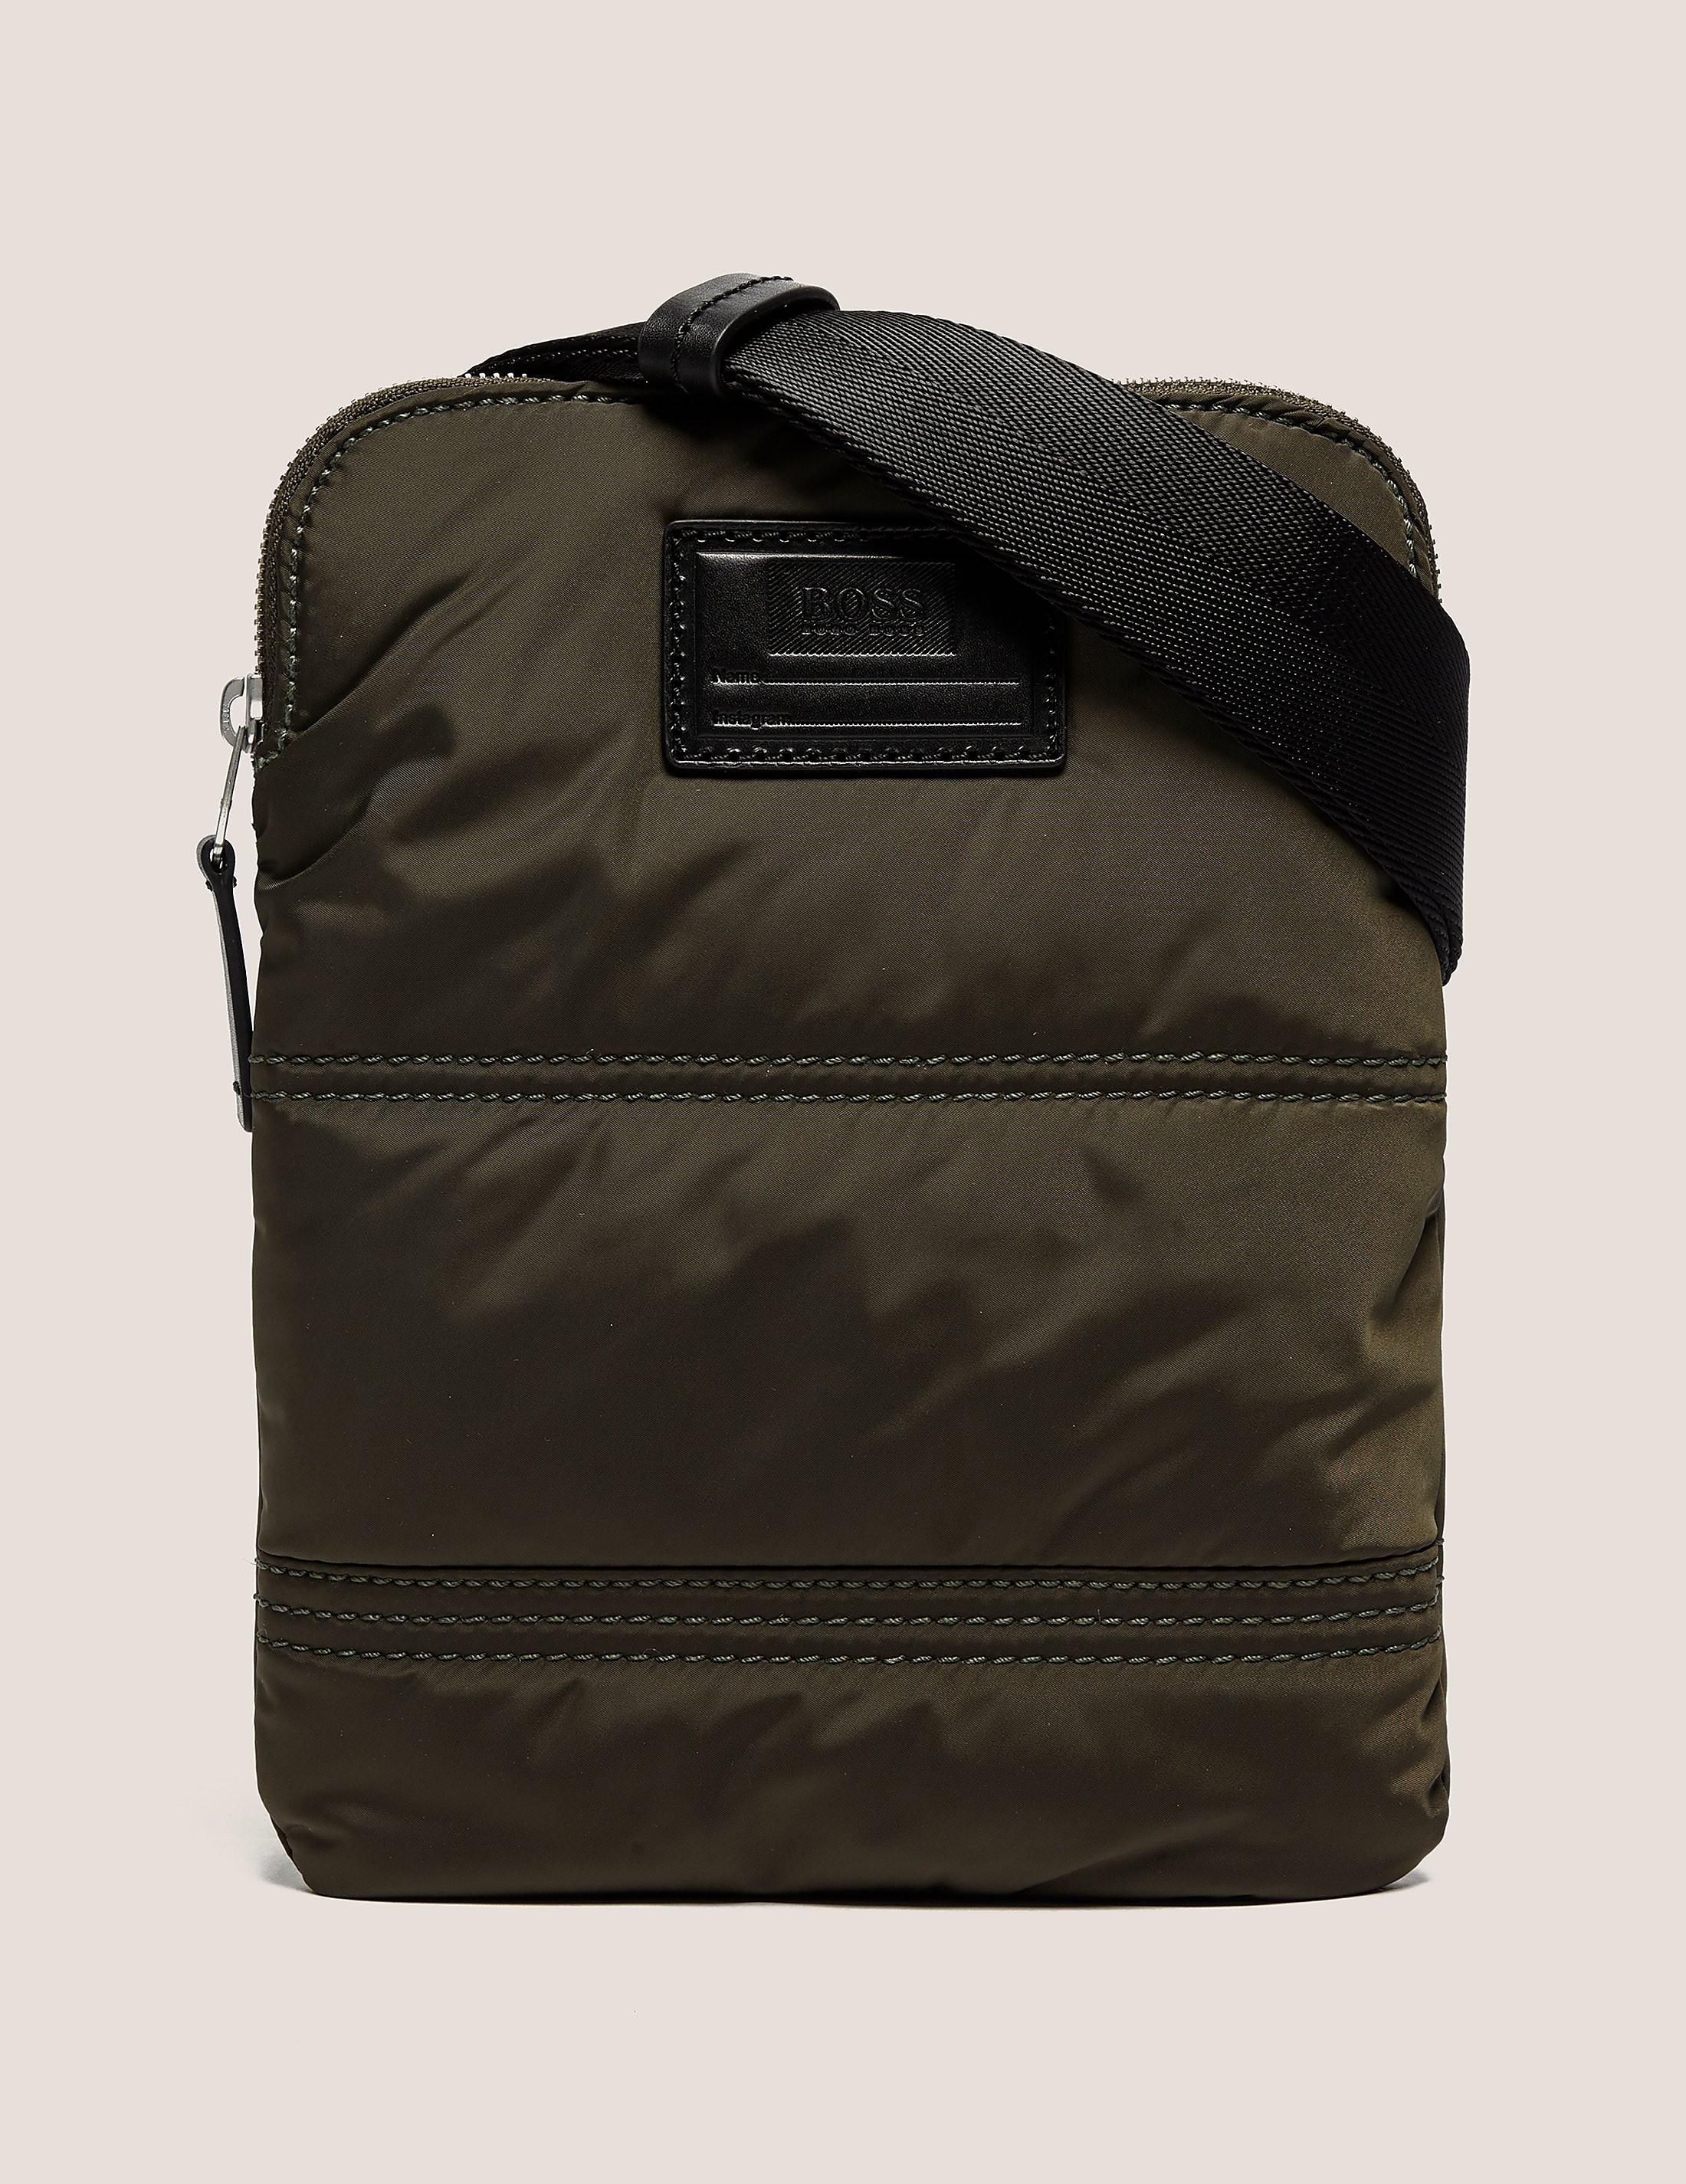 BOSS Orange Envelope Pouch Bag